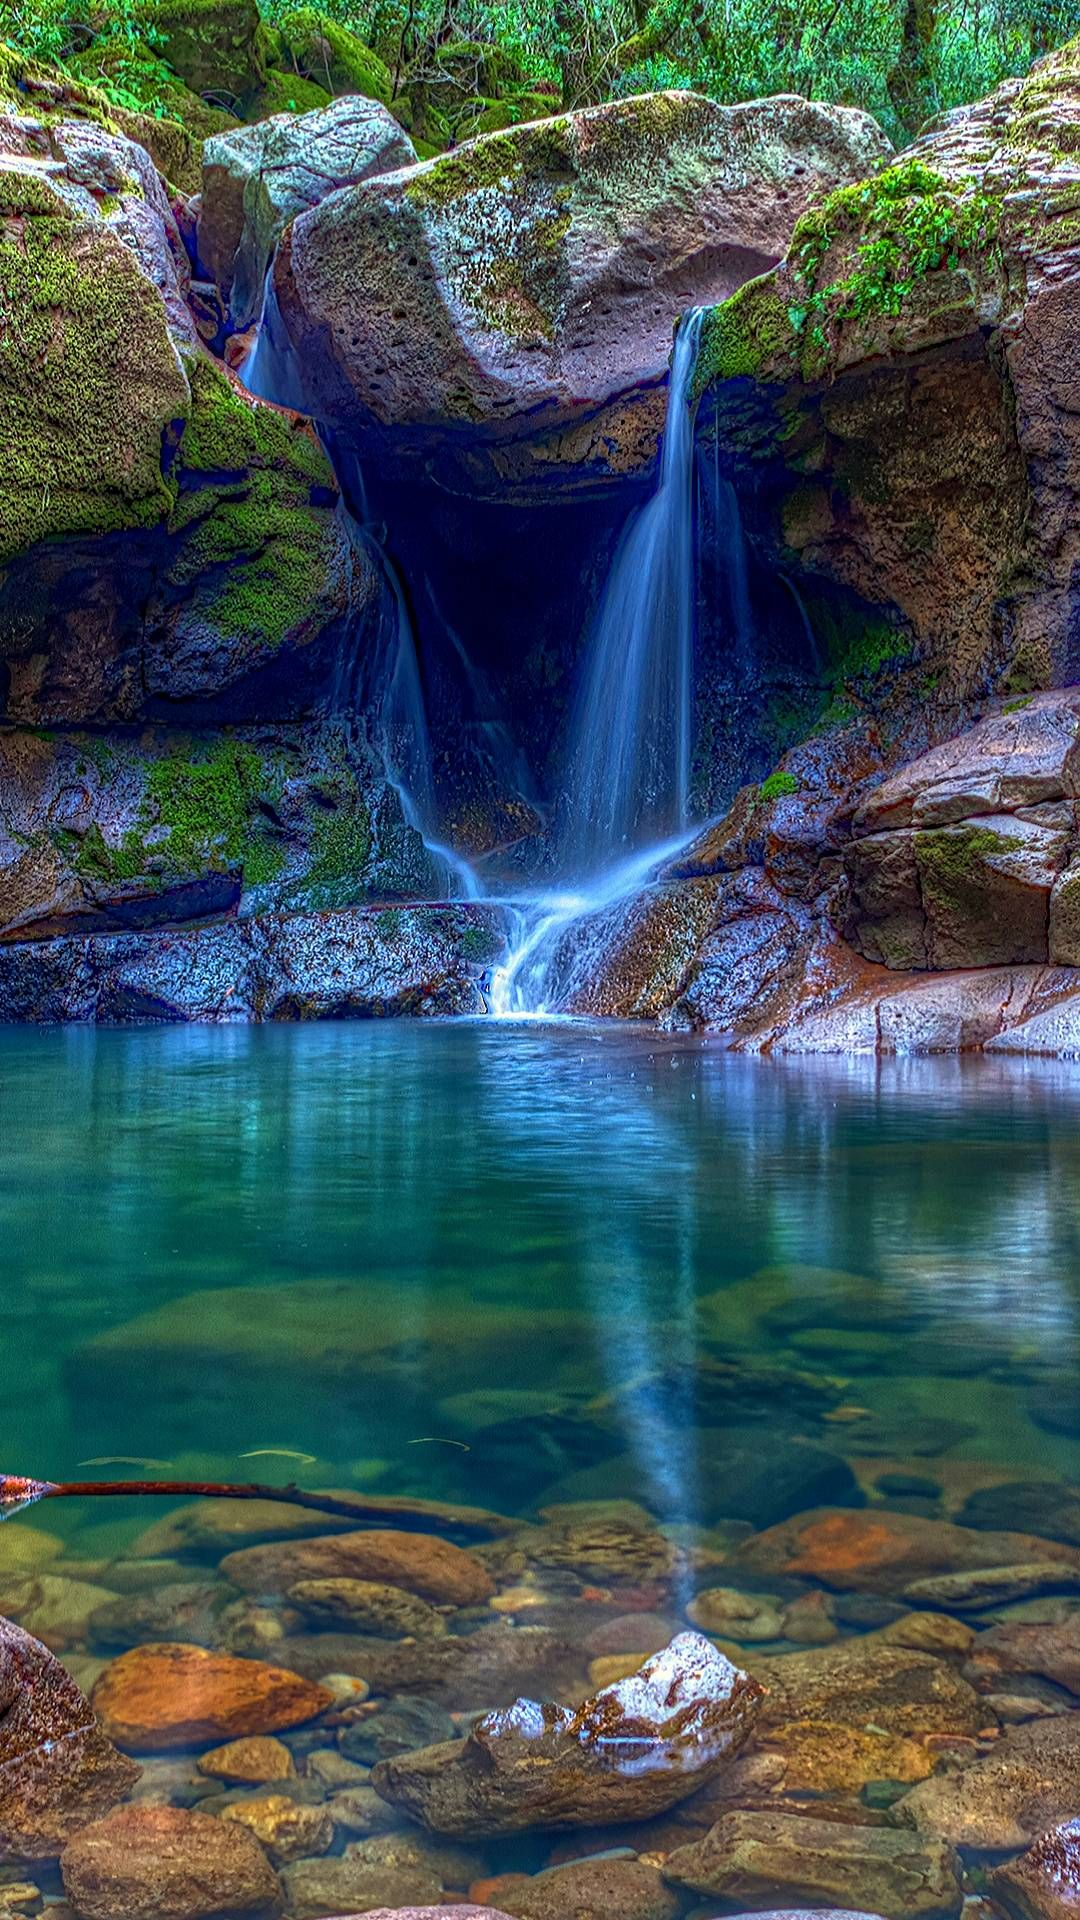 Tranquil Waterfall Waterfalls Beautifulnature Naturephotography Nature Photography Lindas Paisagens Fotografia De Paisagem Lindas Cachoeiras